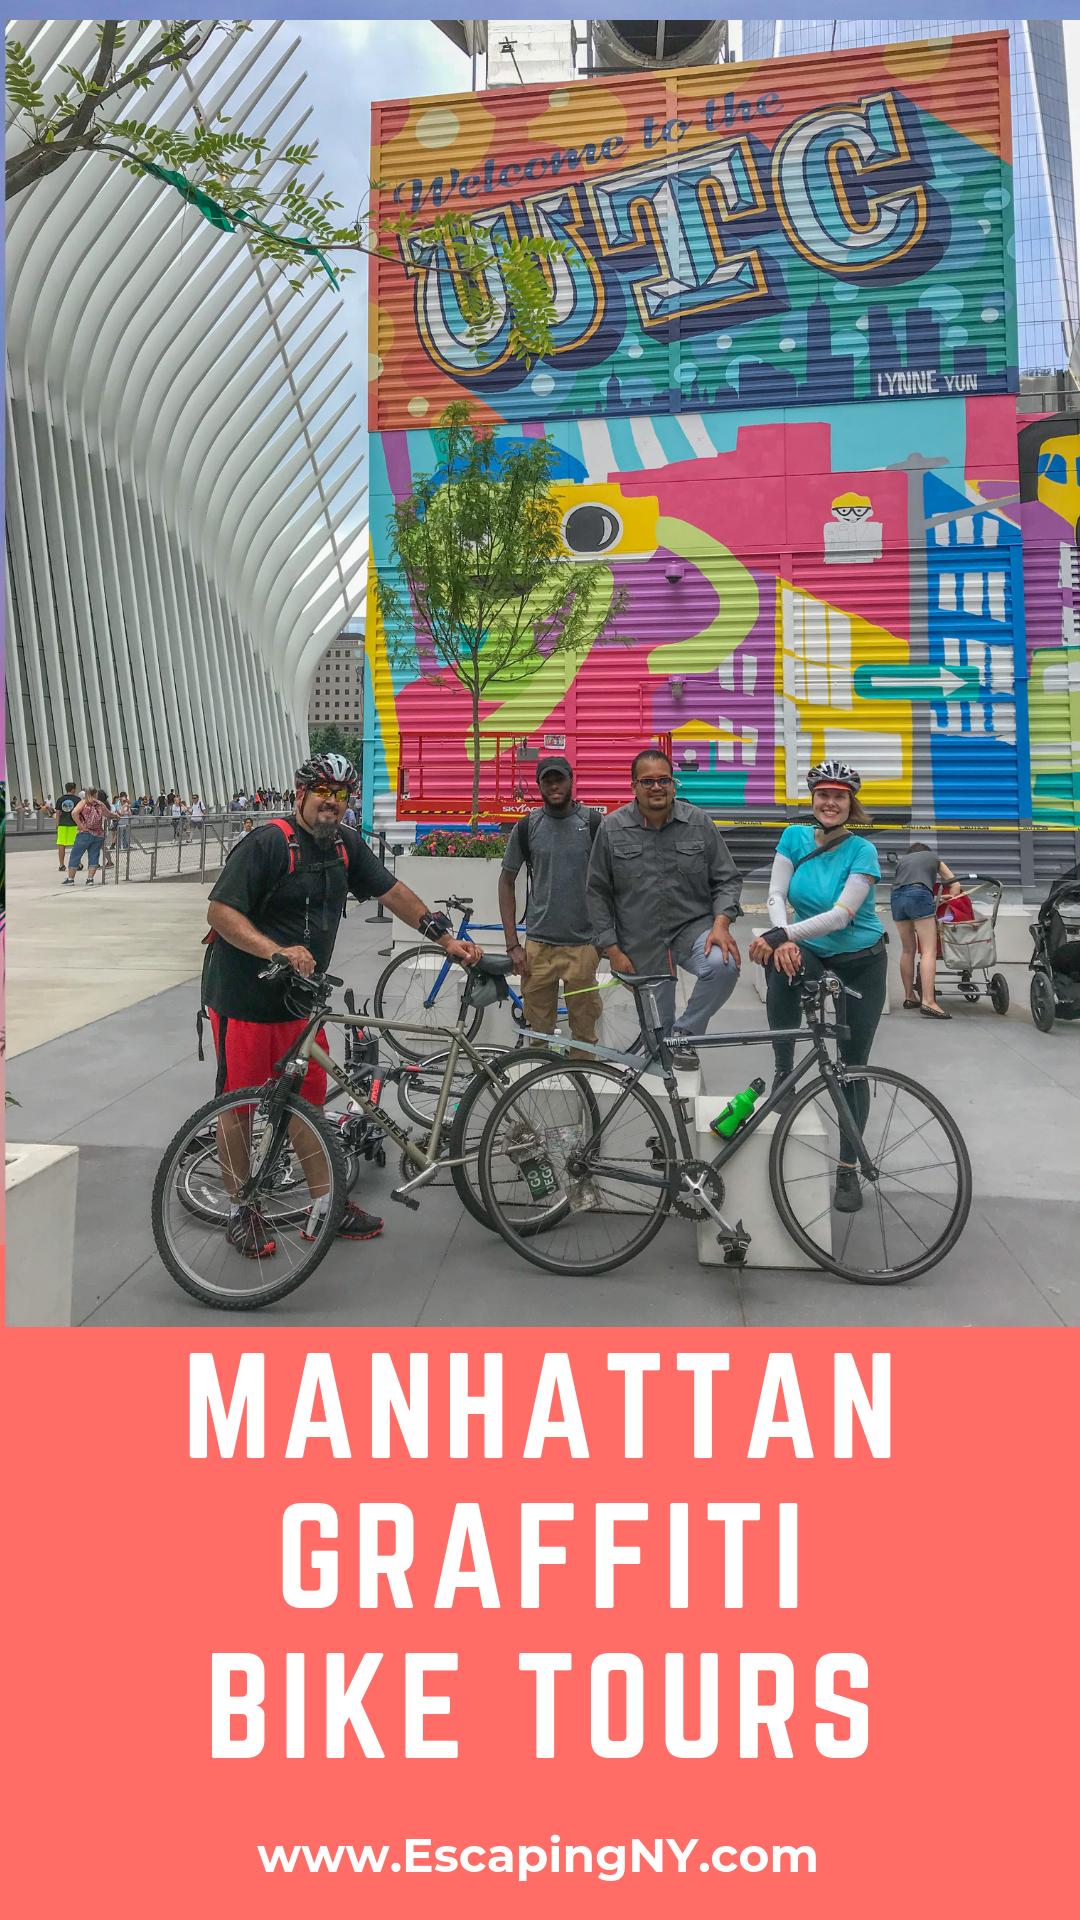 Manhattan_Graffiti_Bike_Tours.png